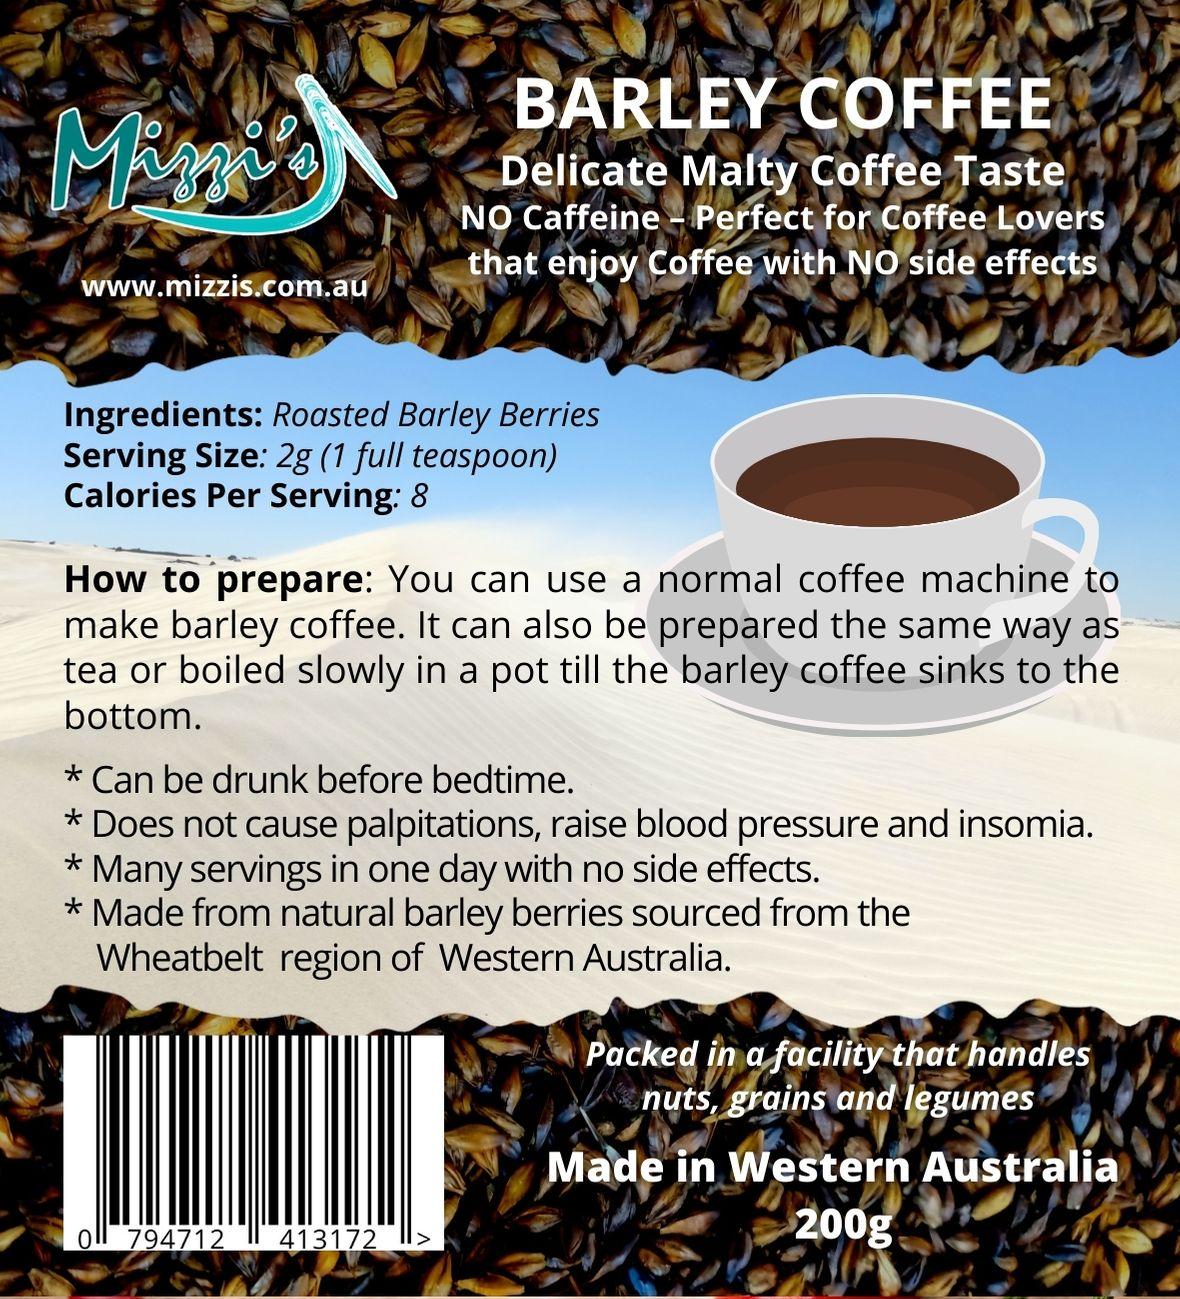 Australian Barley Coffee – 200g